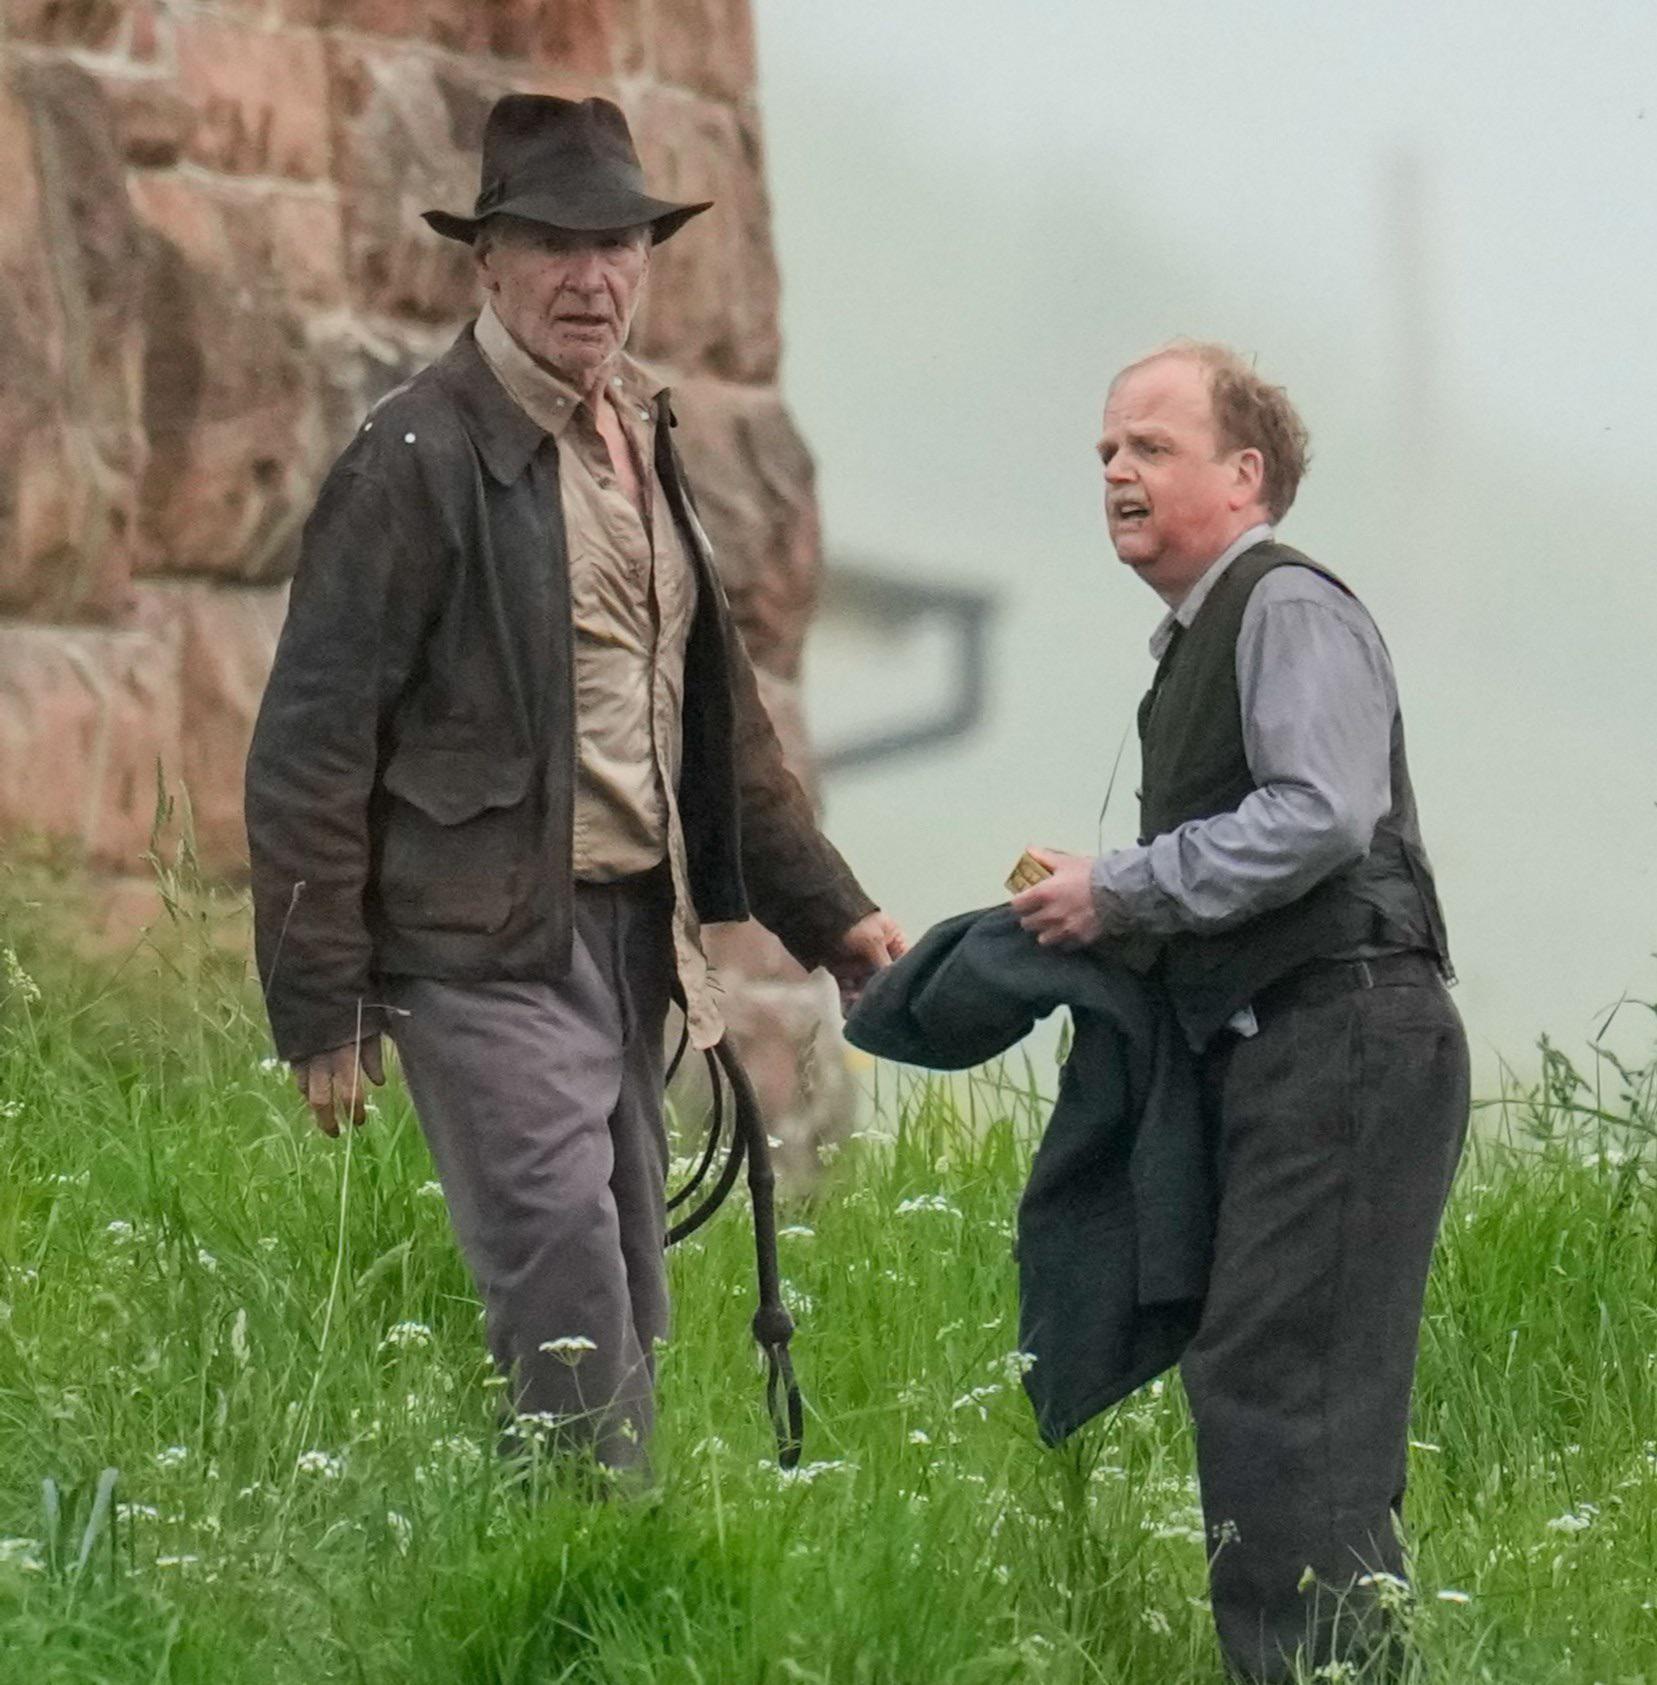 Indiana Jones 5 [Lucasfilm - 2022] - Page 6 E3oTPwSWYAgRp5t?format=jpg&name=large